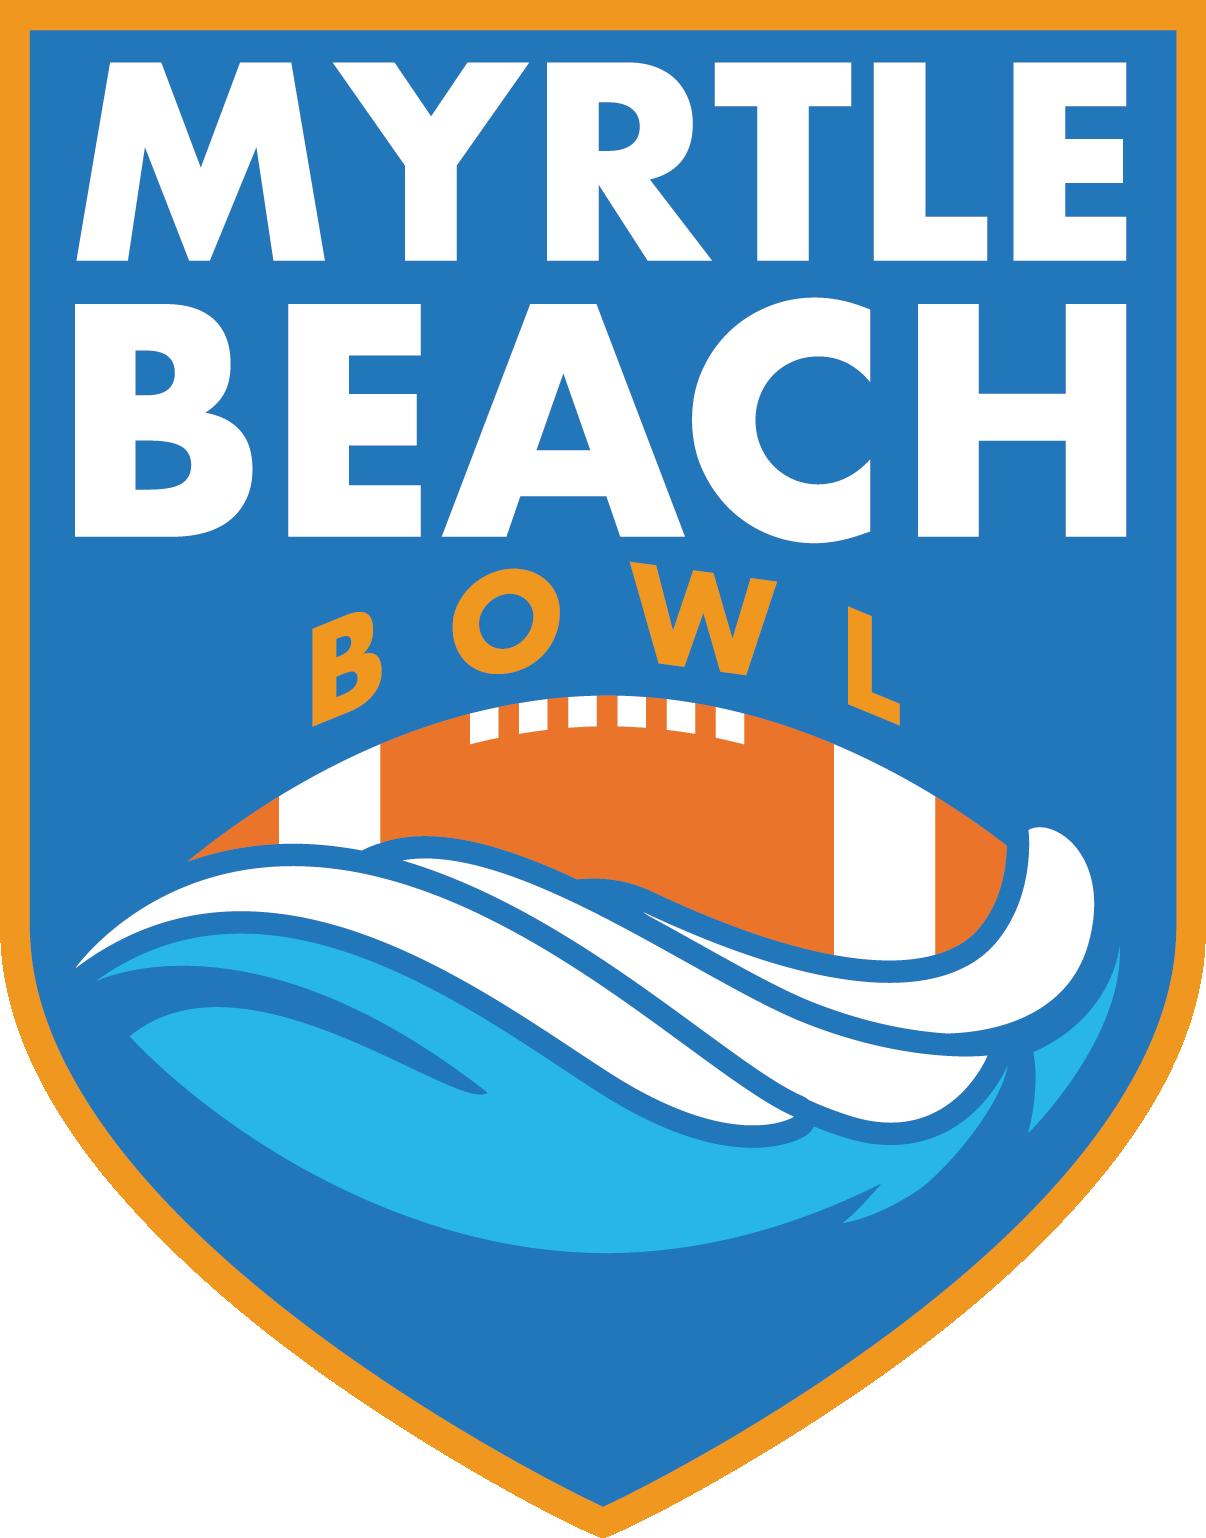 Myrtle Beach Bowl